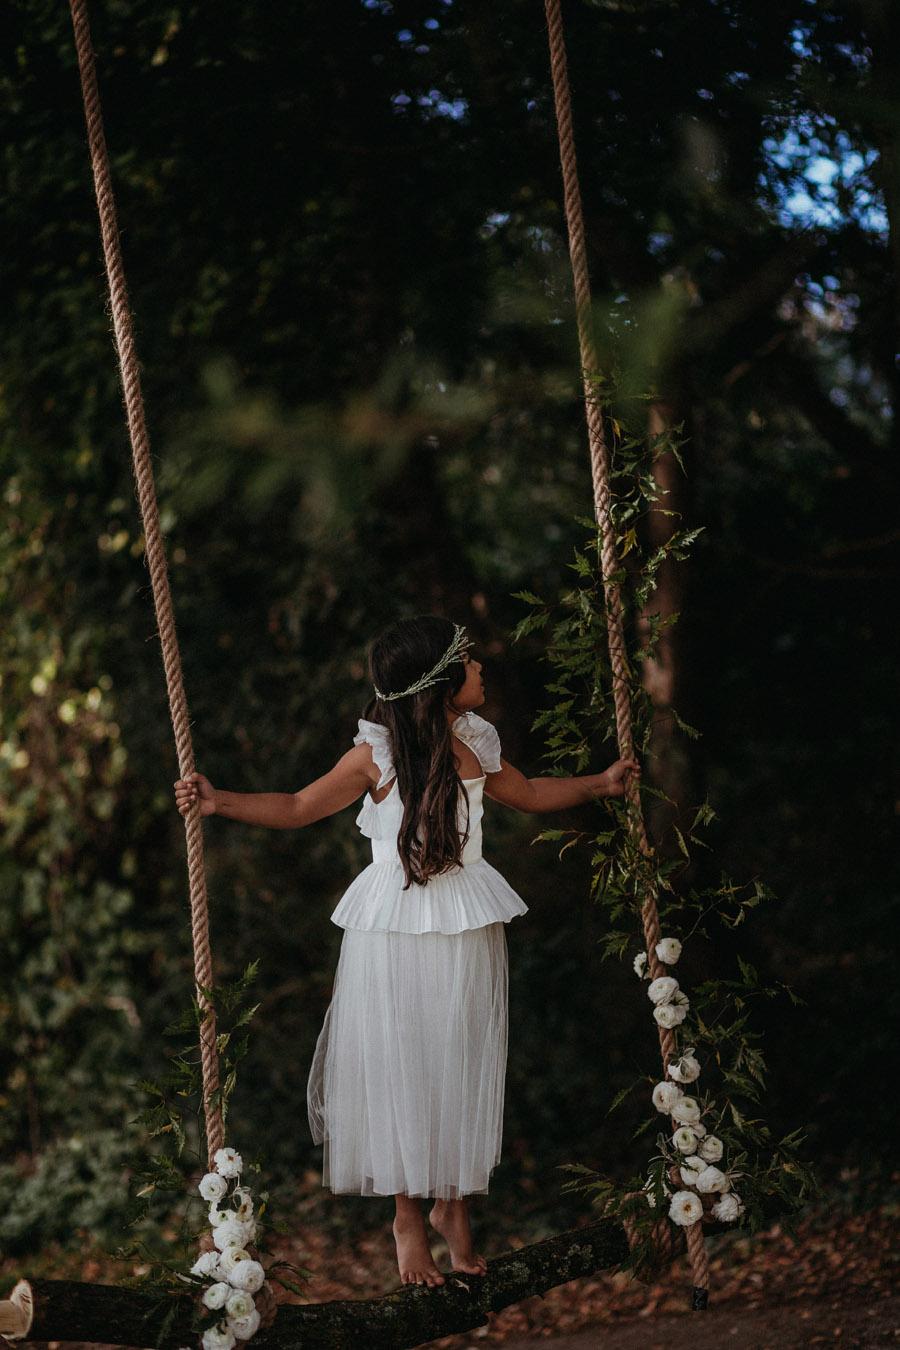 Sanyukta Shrestha autumn daydream bridal collection 2020 (28)